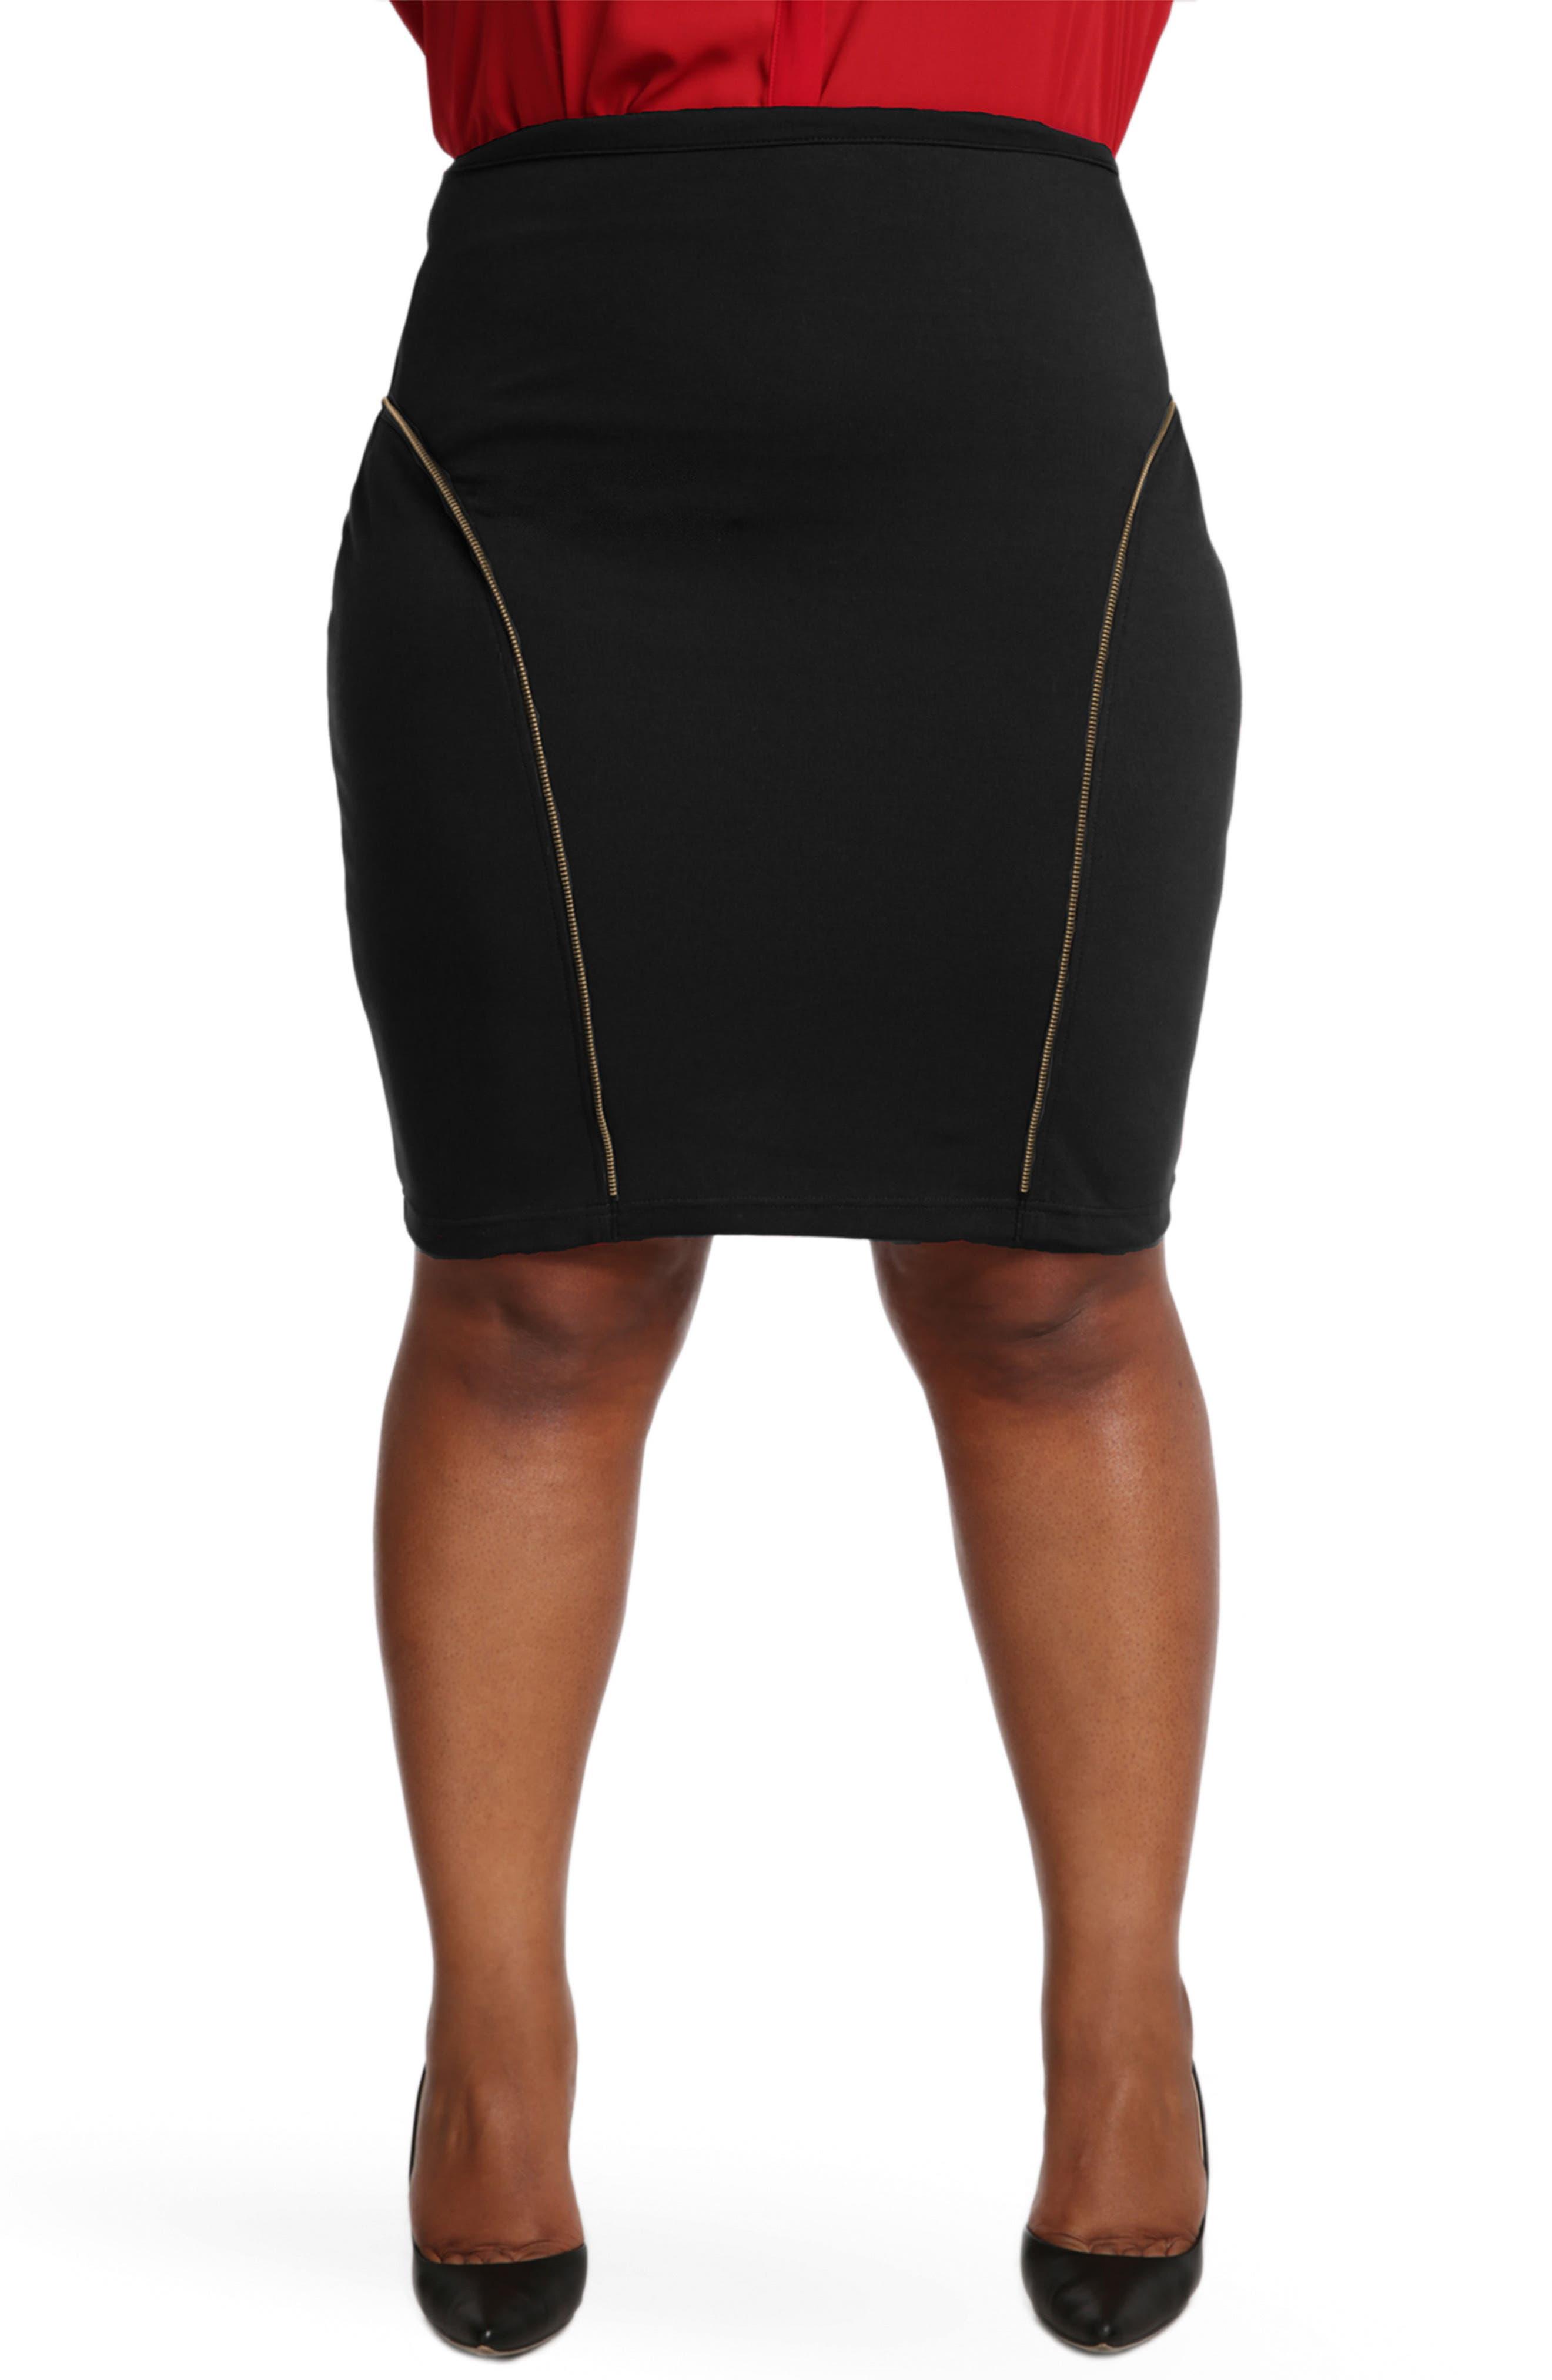 Plus Size Poetic Justice Tiffy Ponte Knit Pencil Skirt